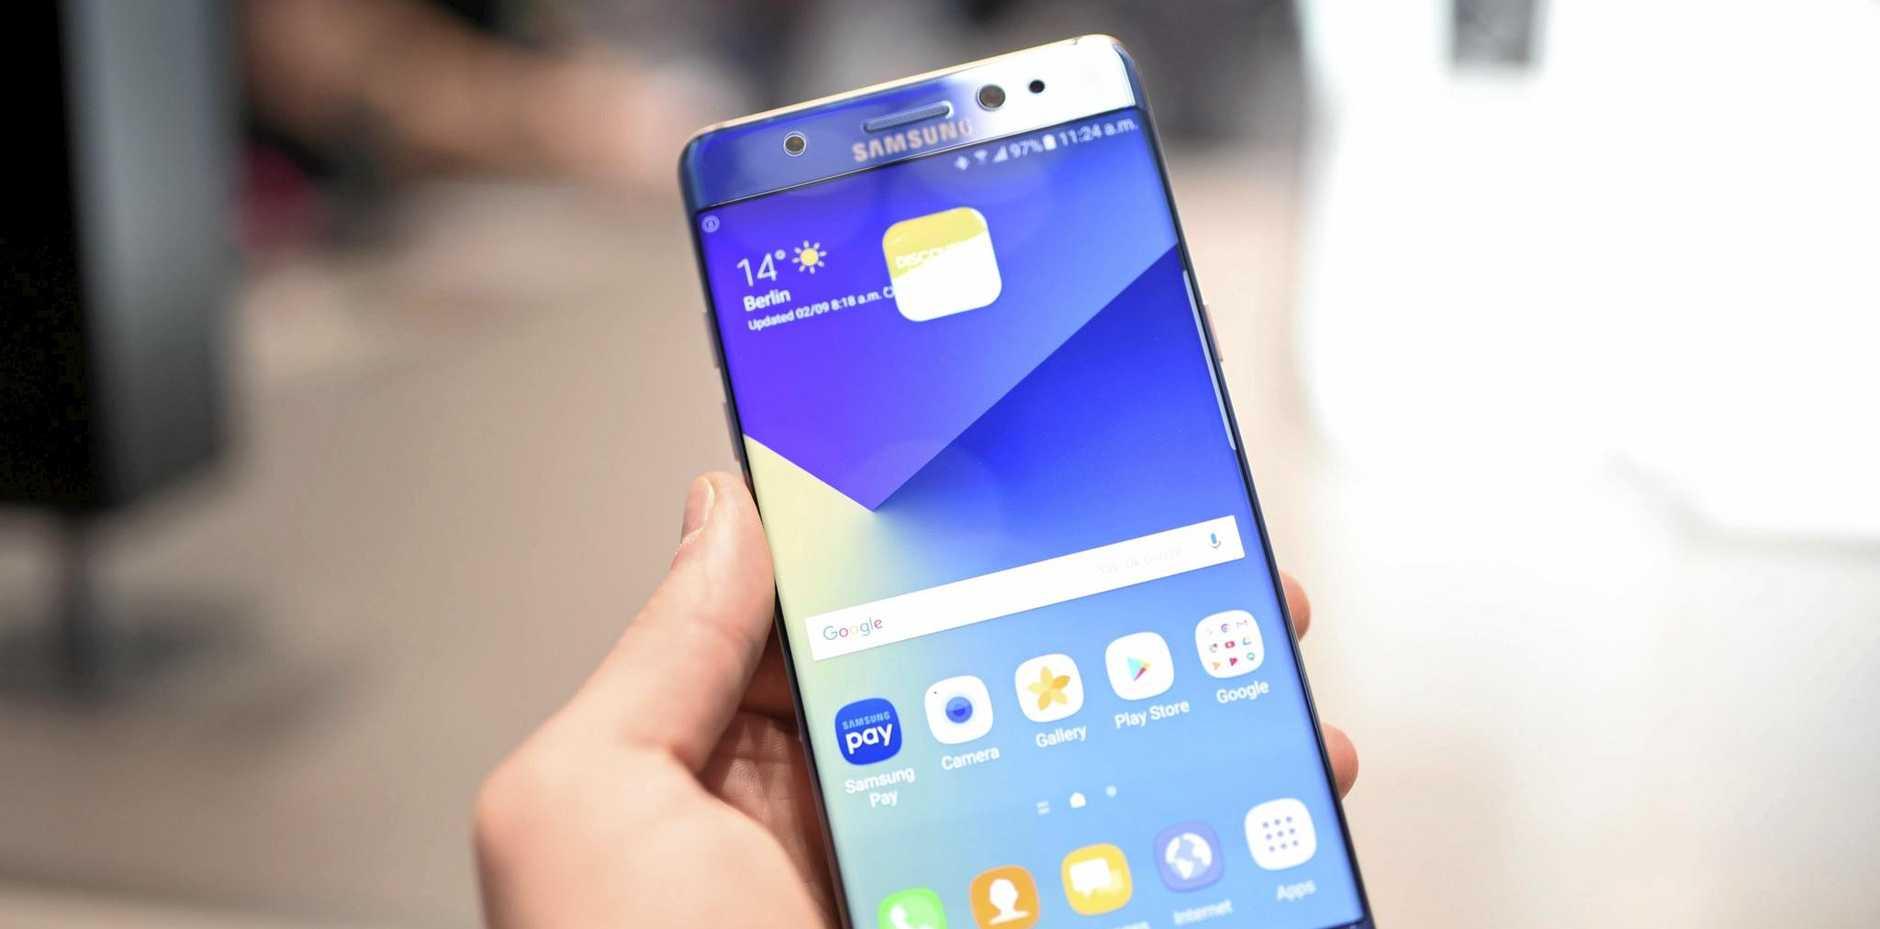 A Samsung Galaxy Note 7.